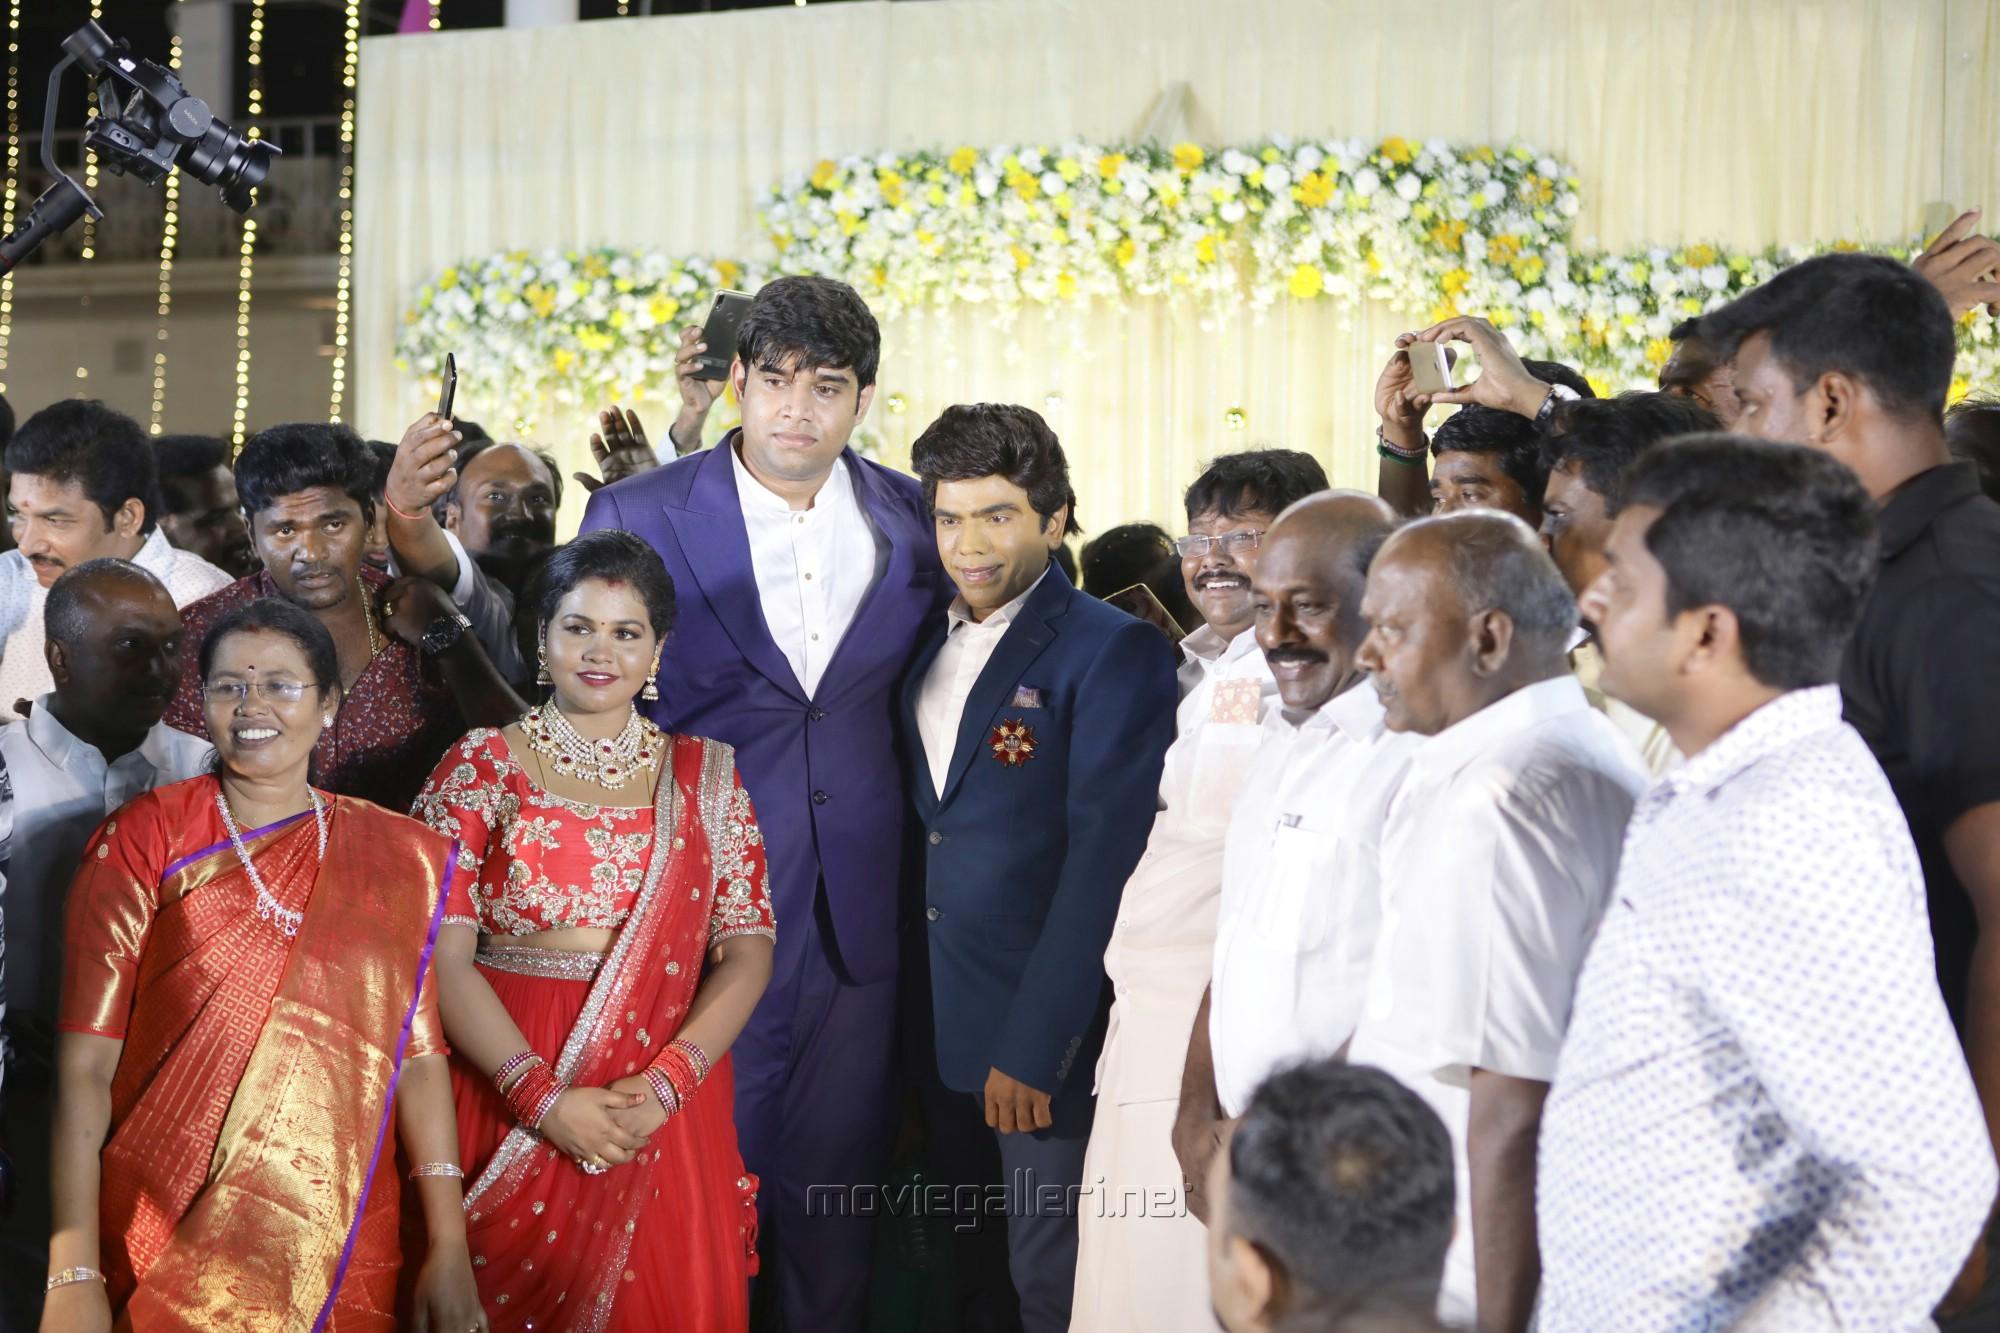 Saravana Stores Legend Saravanan, M. Subramaniam @ Salem RR Briyani Tamilselvan daughter Wedding Reception Stills